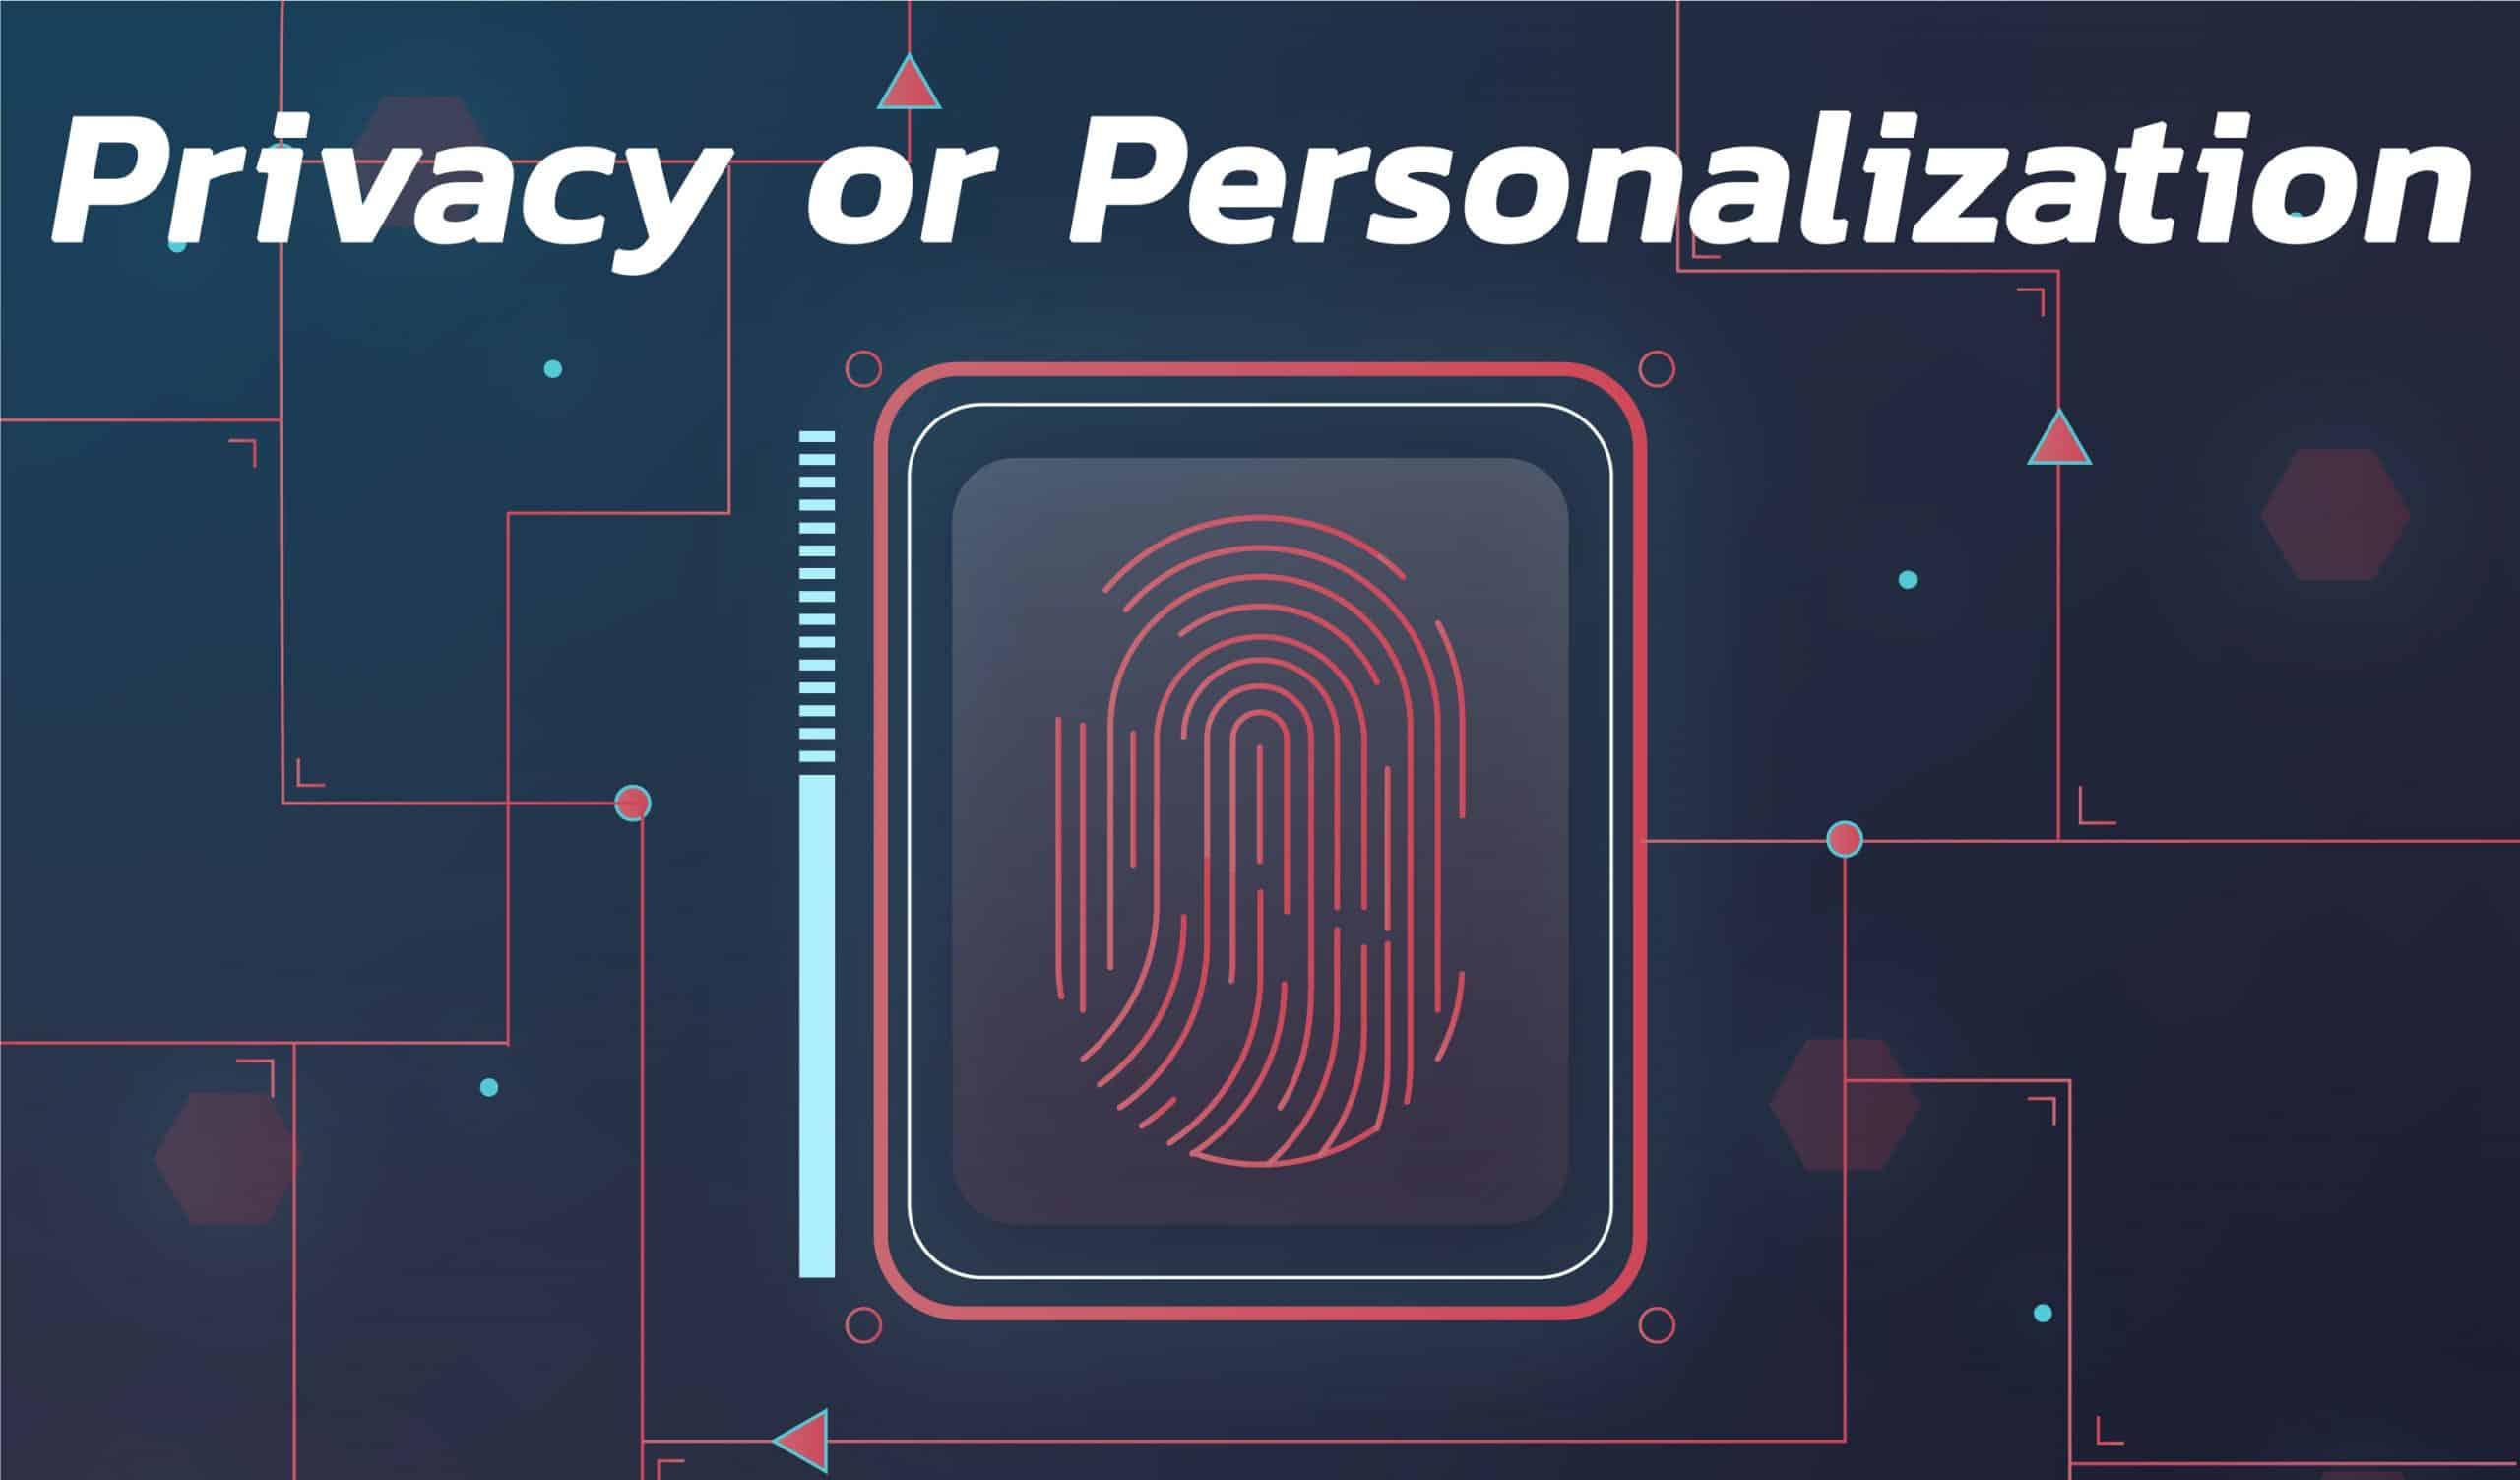 Personalization แค่ไหนอย่างไรดี ในวันที่ประเด็นเรื่อง Privacy และ PDPA มา